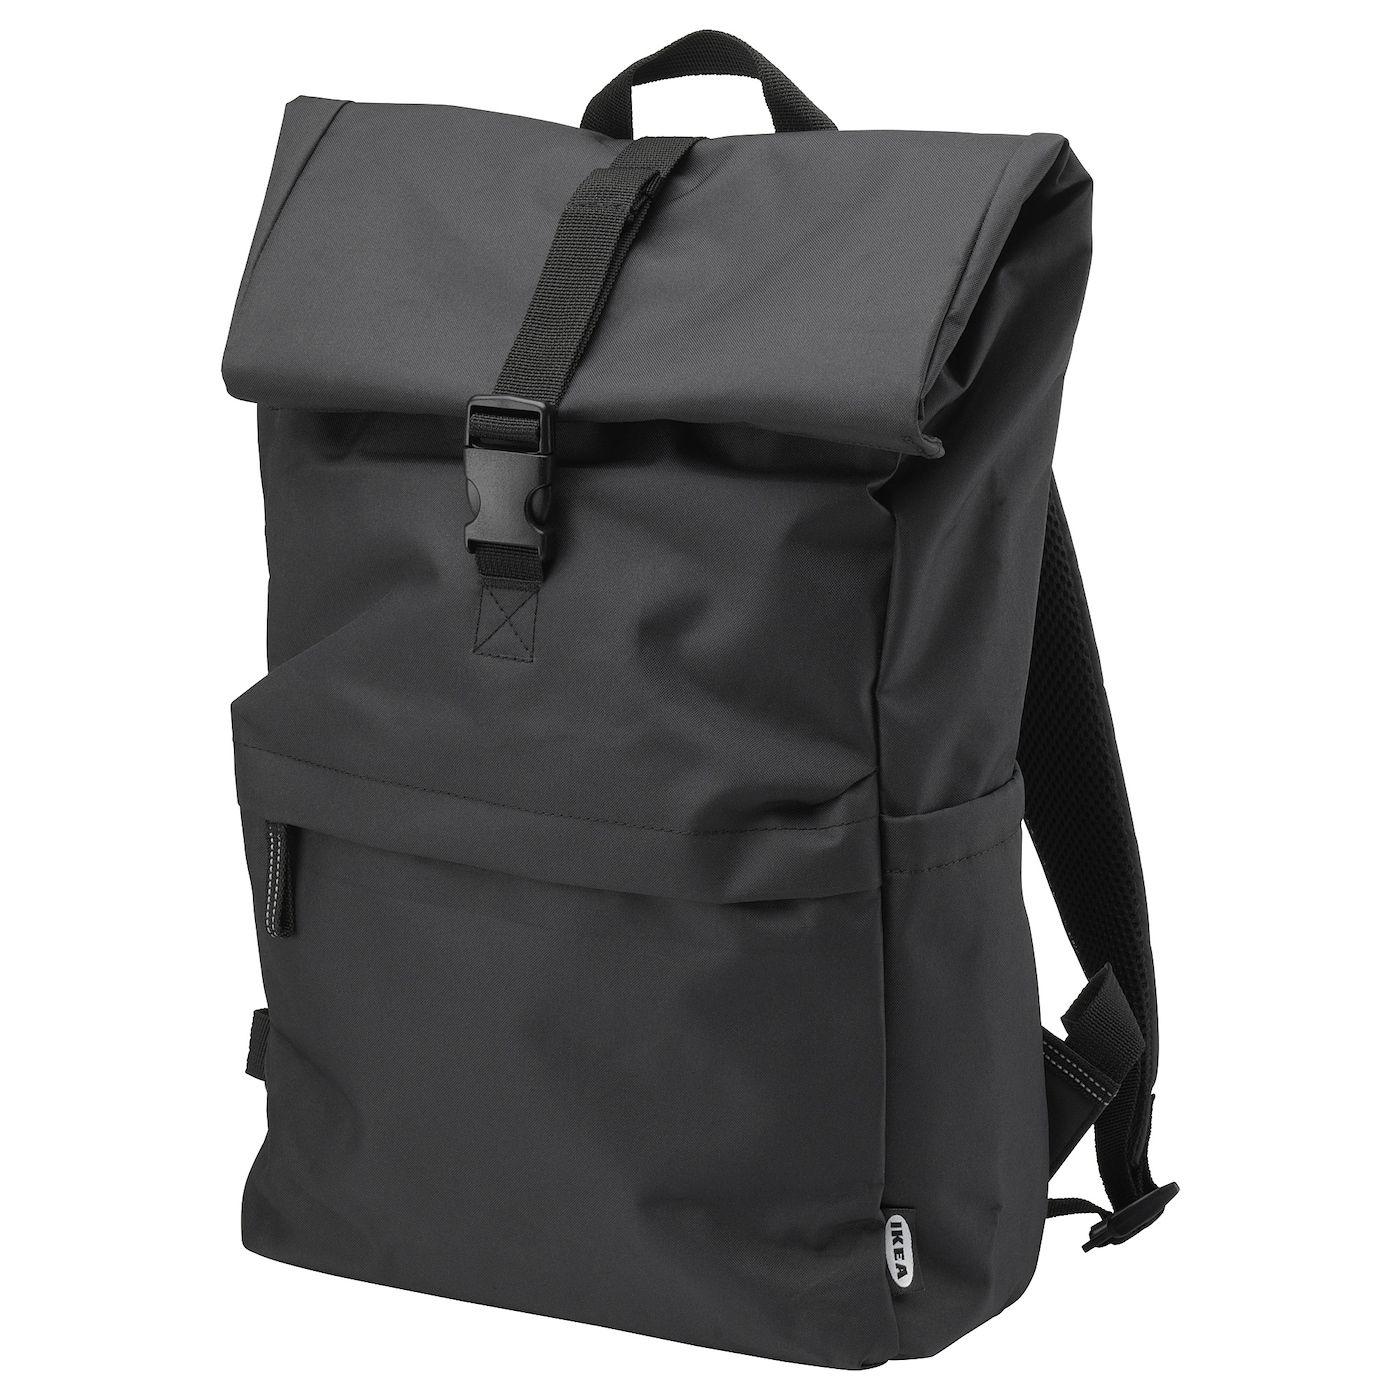 Starttid Backpack Black 5 Gallon In 2020 Black Backpack Backpacks Backpack Travel Accessories